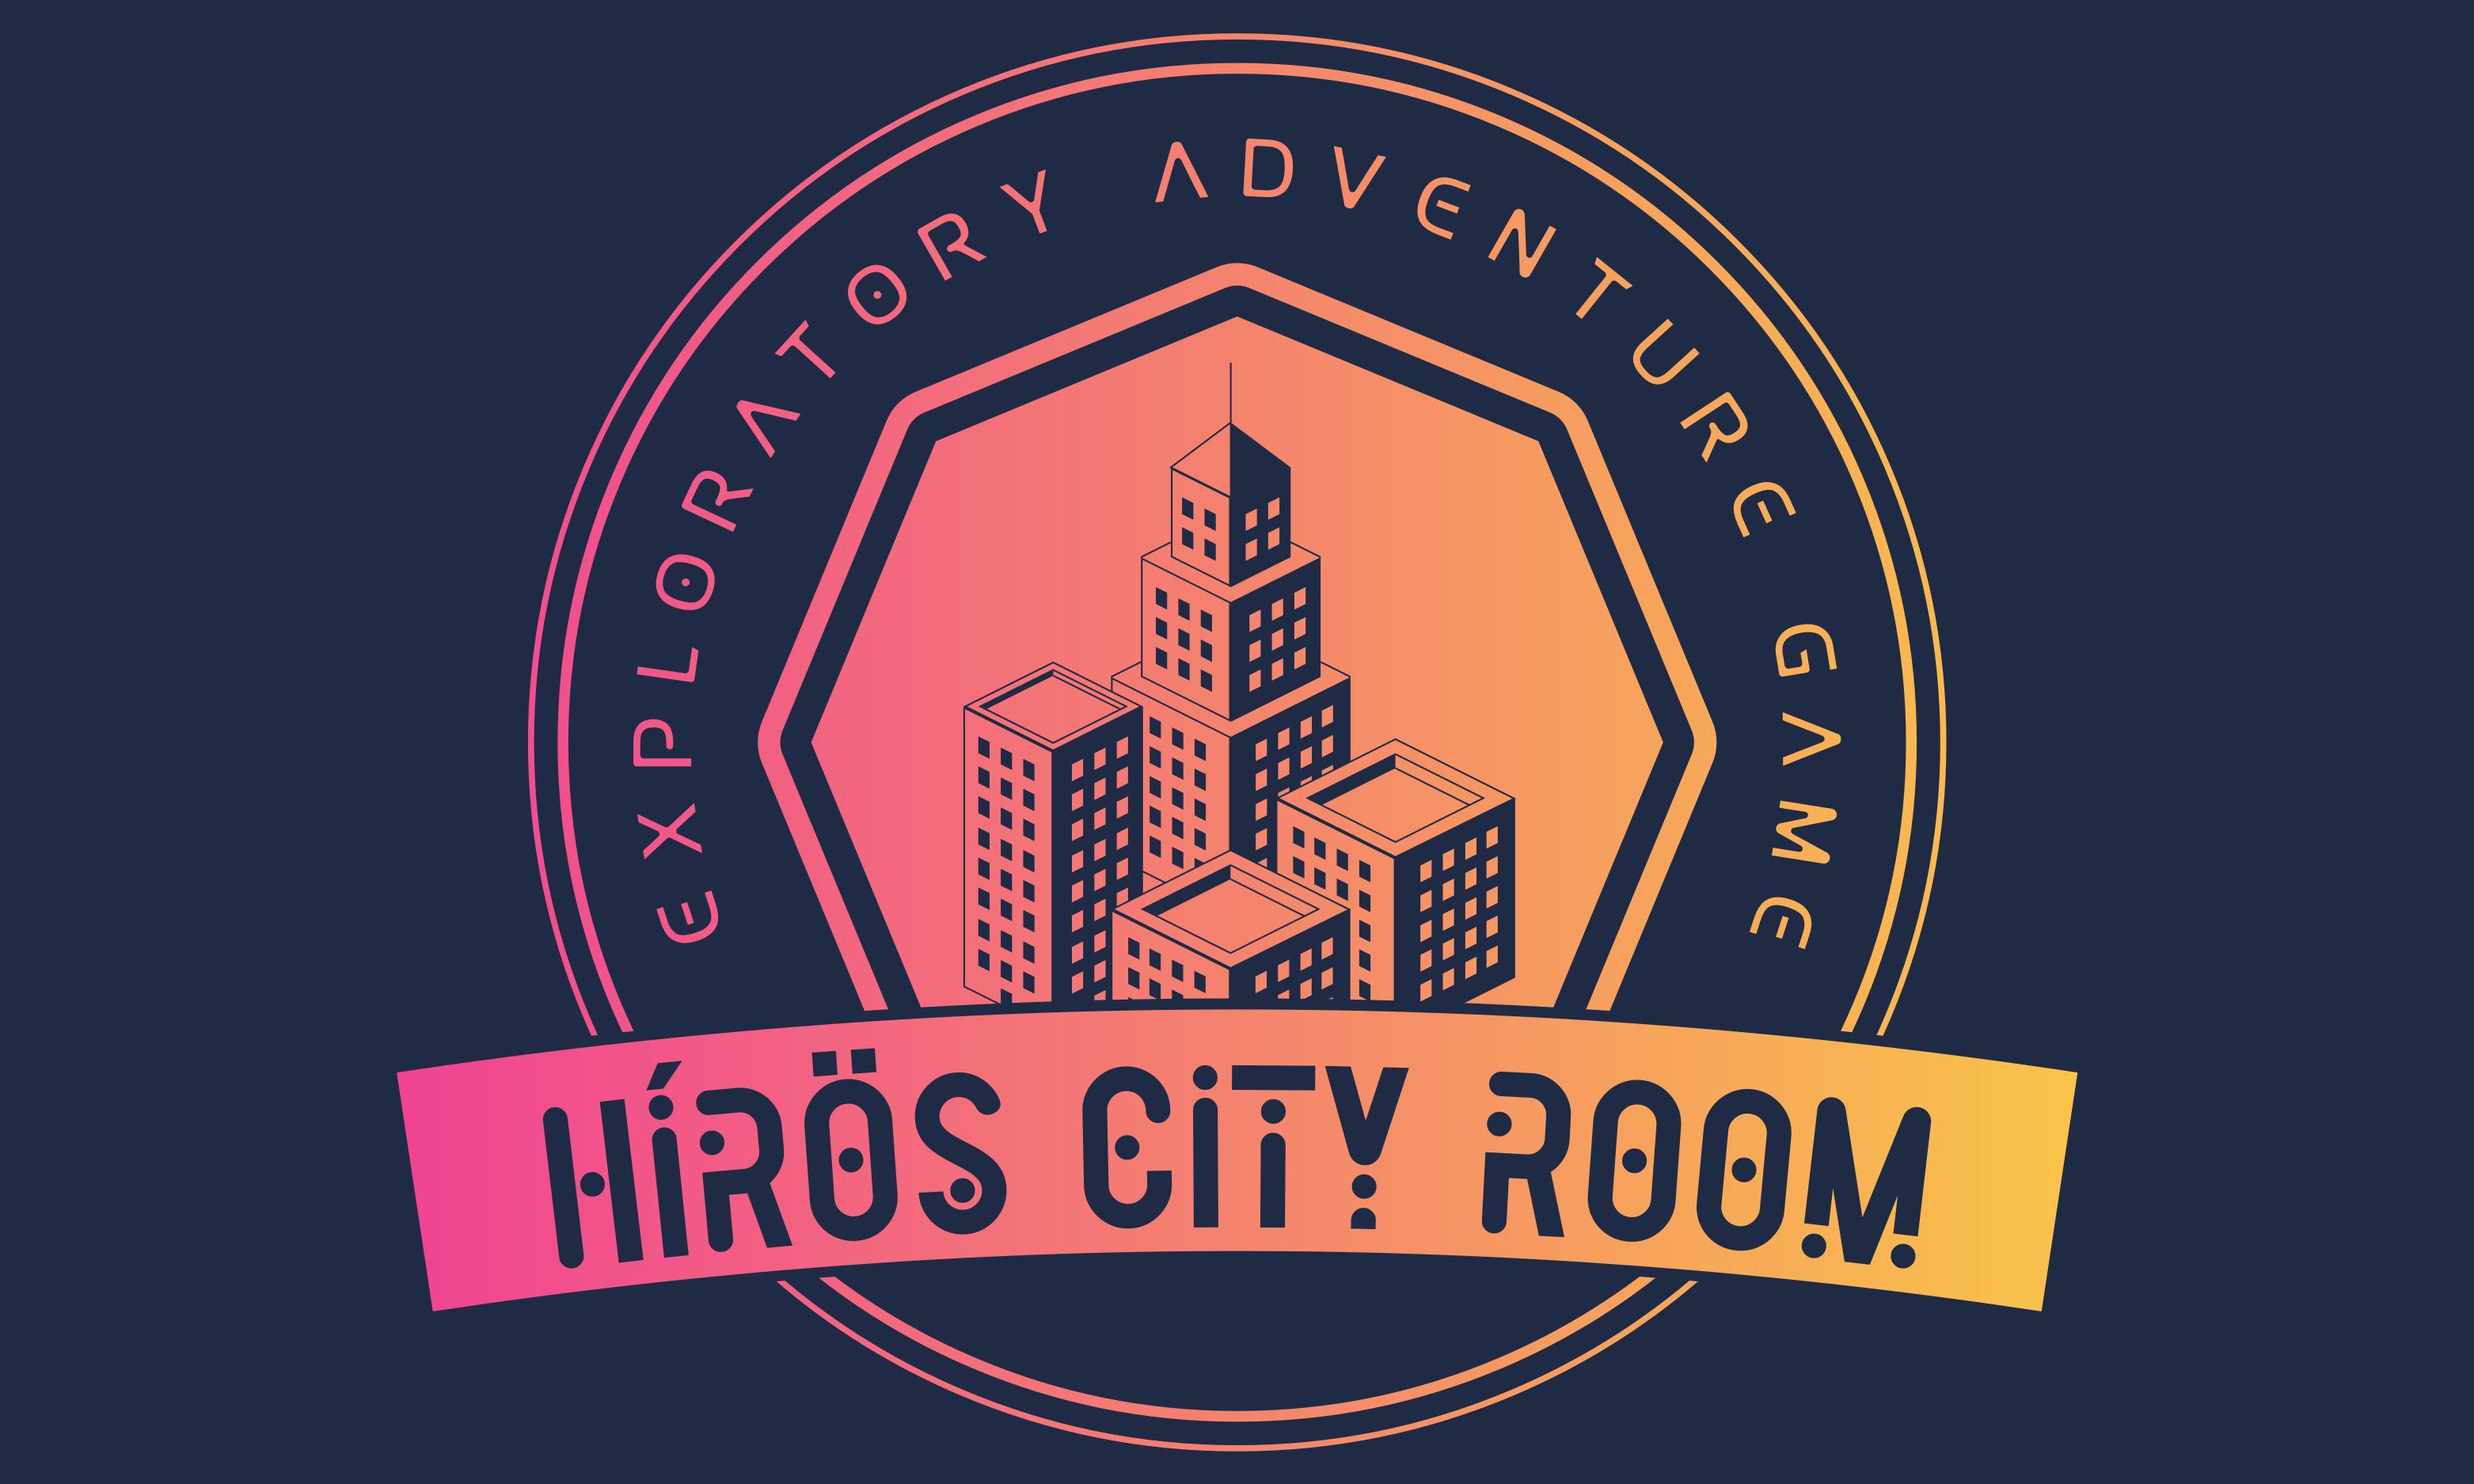 https://hirosexitroom.hu/galeria/jZnWxRfURxoI9dfNuTA4HOveTUeEKODJNOxmjAu8.png